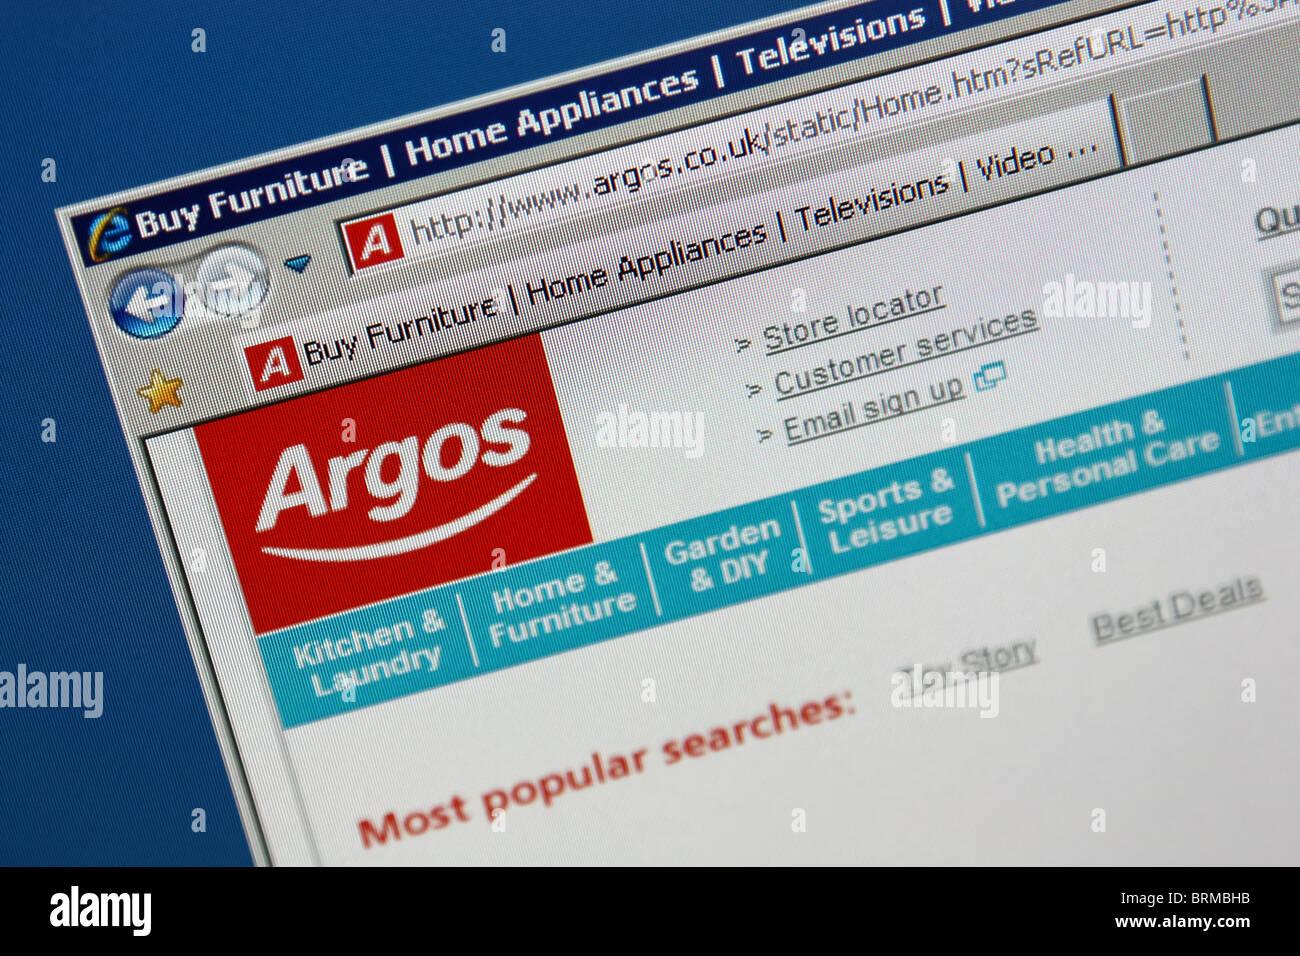 Argos store website screenshot - Stock Image